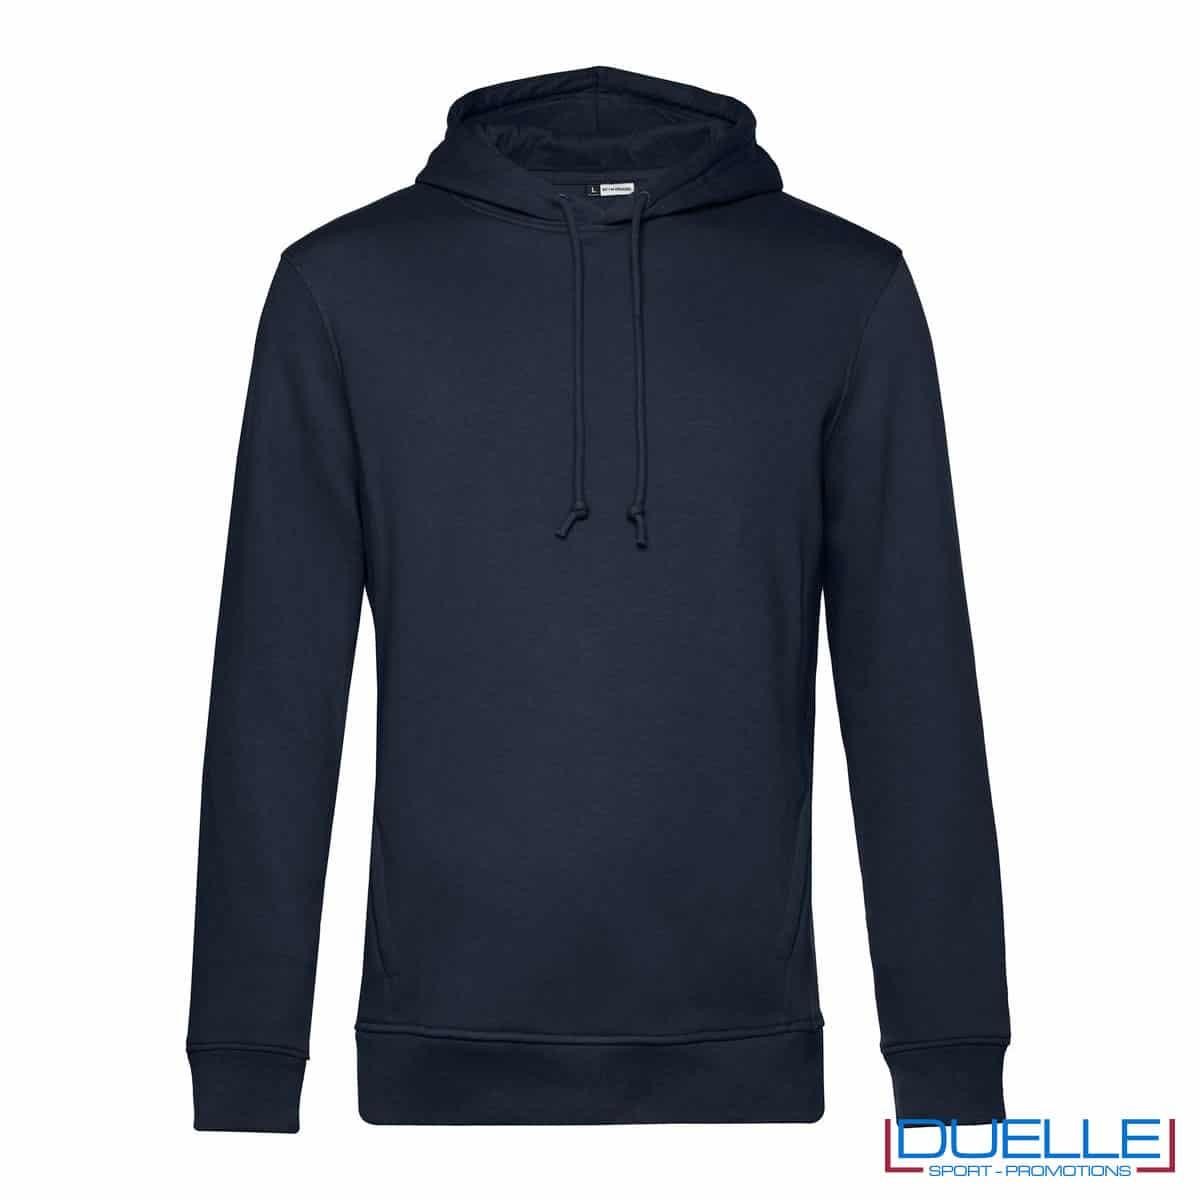 Felpa eco-friendly in cotone e R-PET blu navy